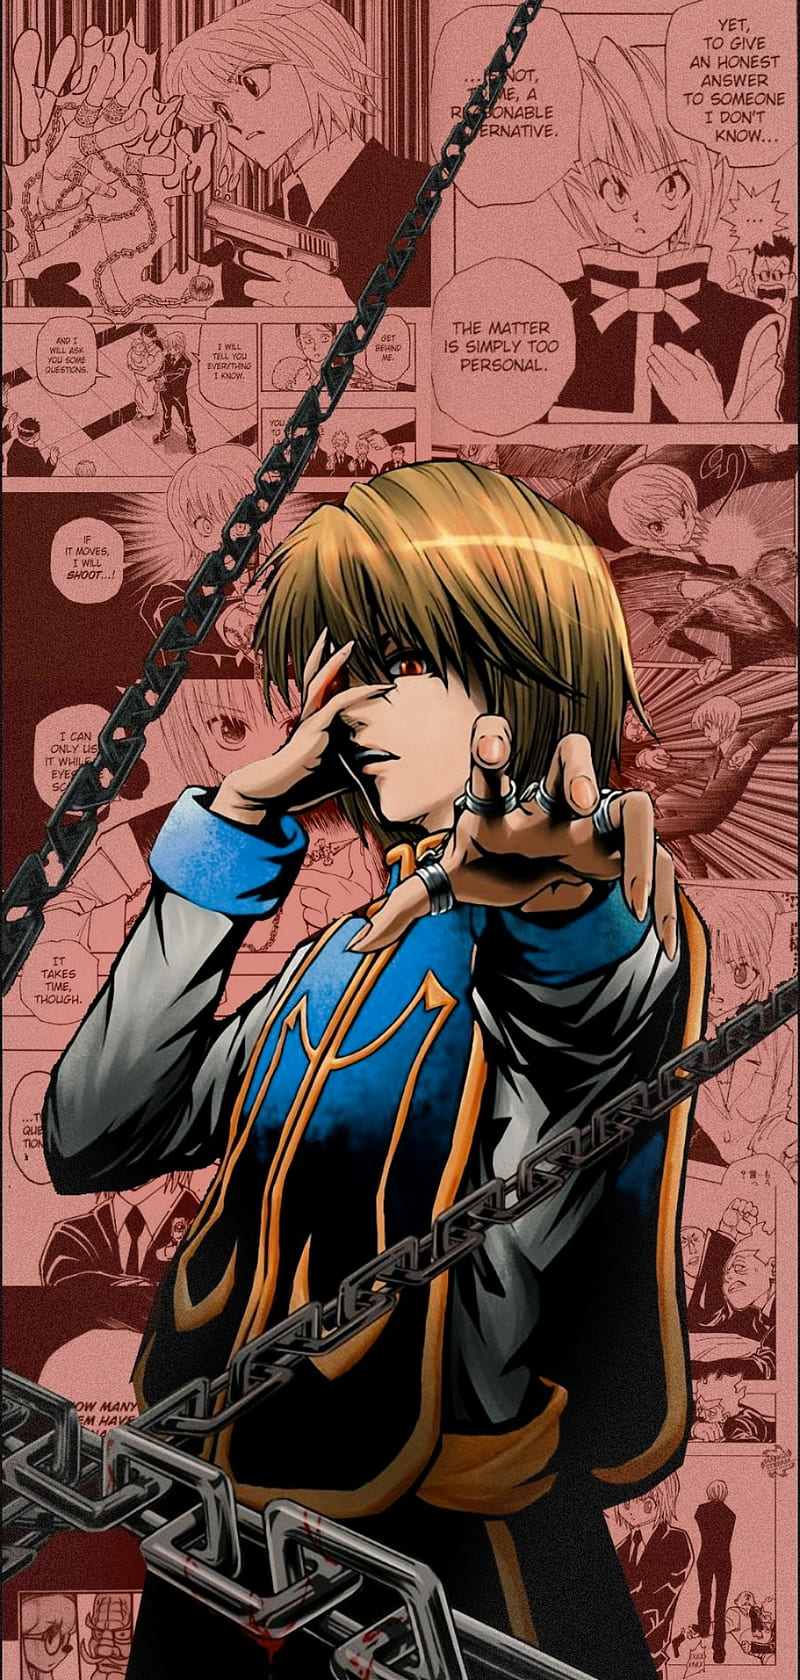 Kurapika Aesthetic Aesthetic Anime Hunter X Hunter Hunterxhunter Manga Hd Mobile Wallpaper Peakpx